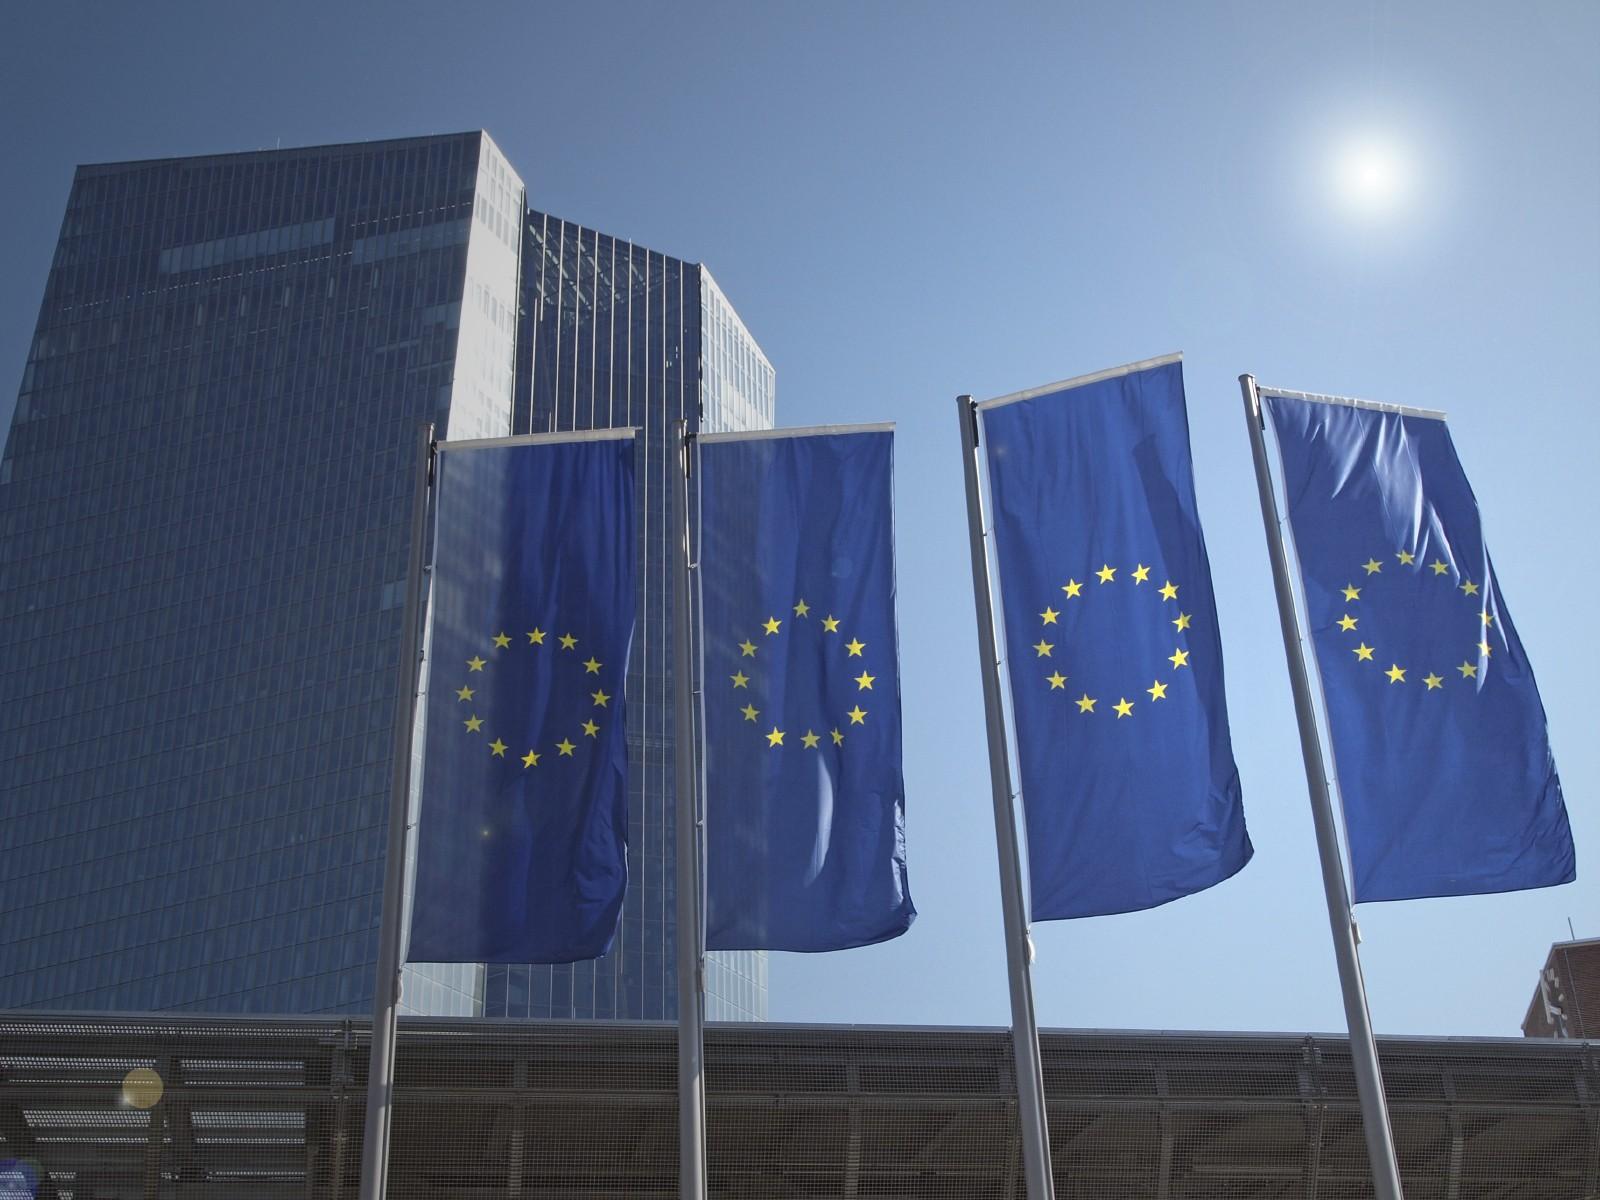 ECB in Frankfurt am Main